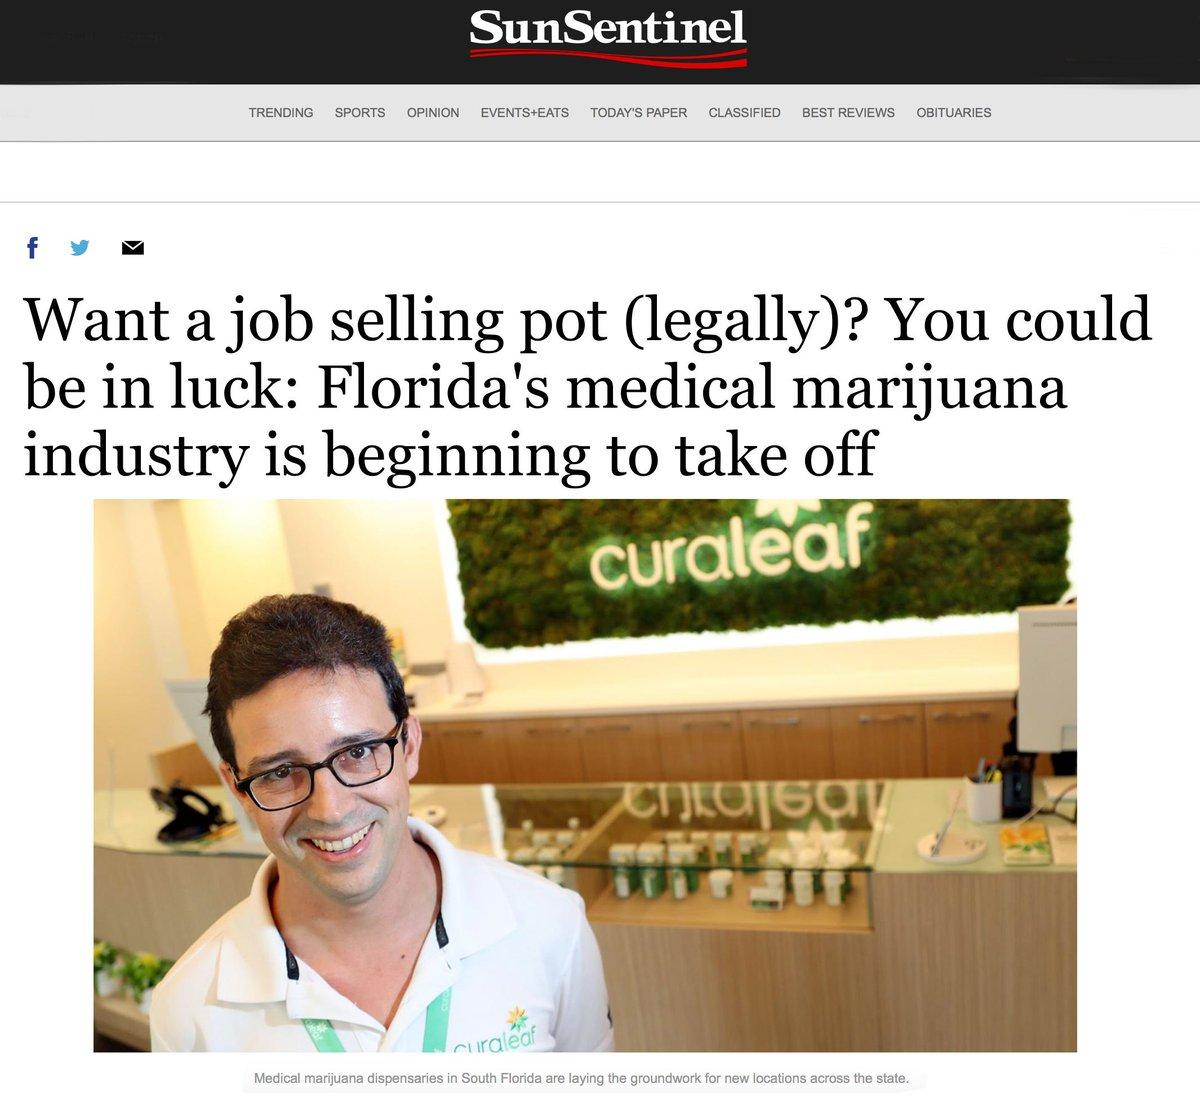 Curaleaf Florida on Twitter: